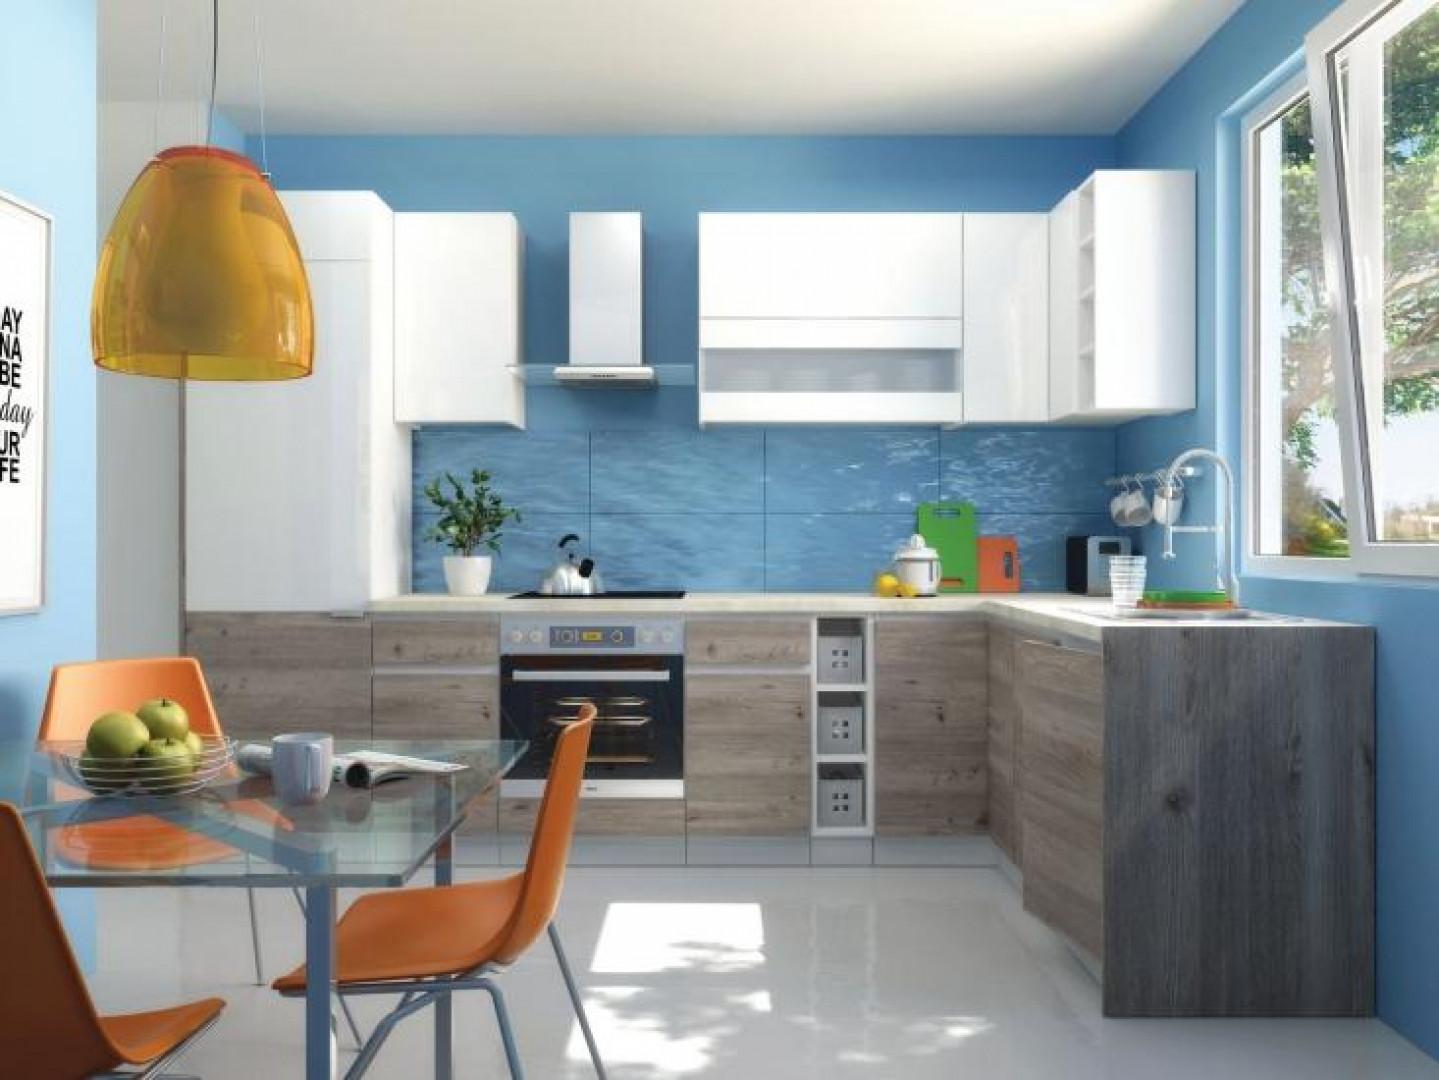 System kuchenny Campari z oferty salonu RS Design. Fot. RS Design